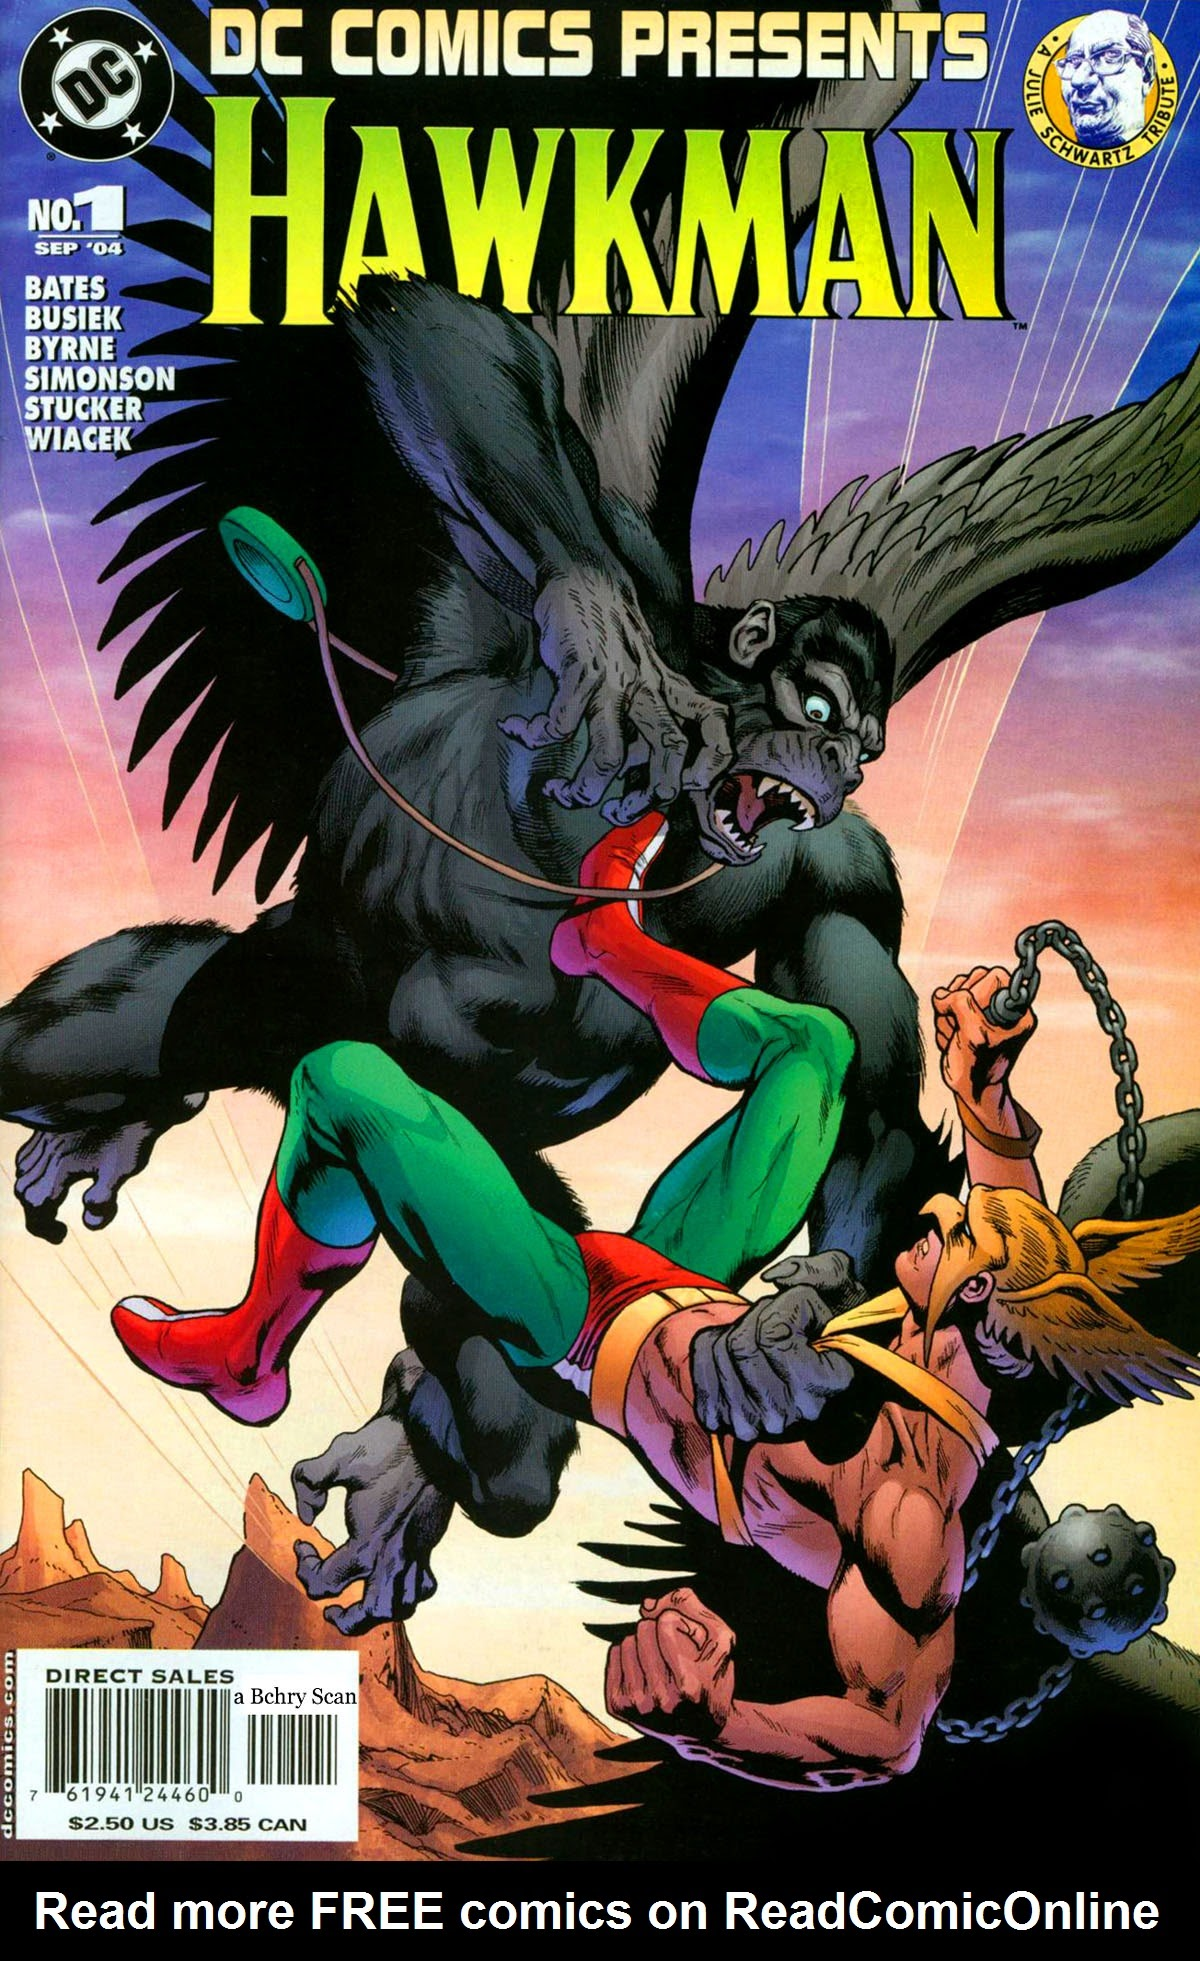 DC Comics Presents (2004) Hawkman Page 1